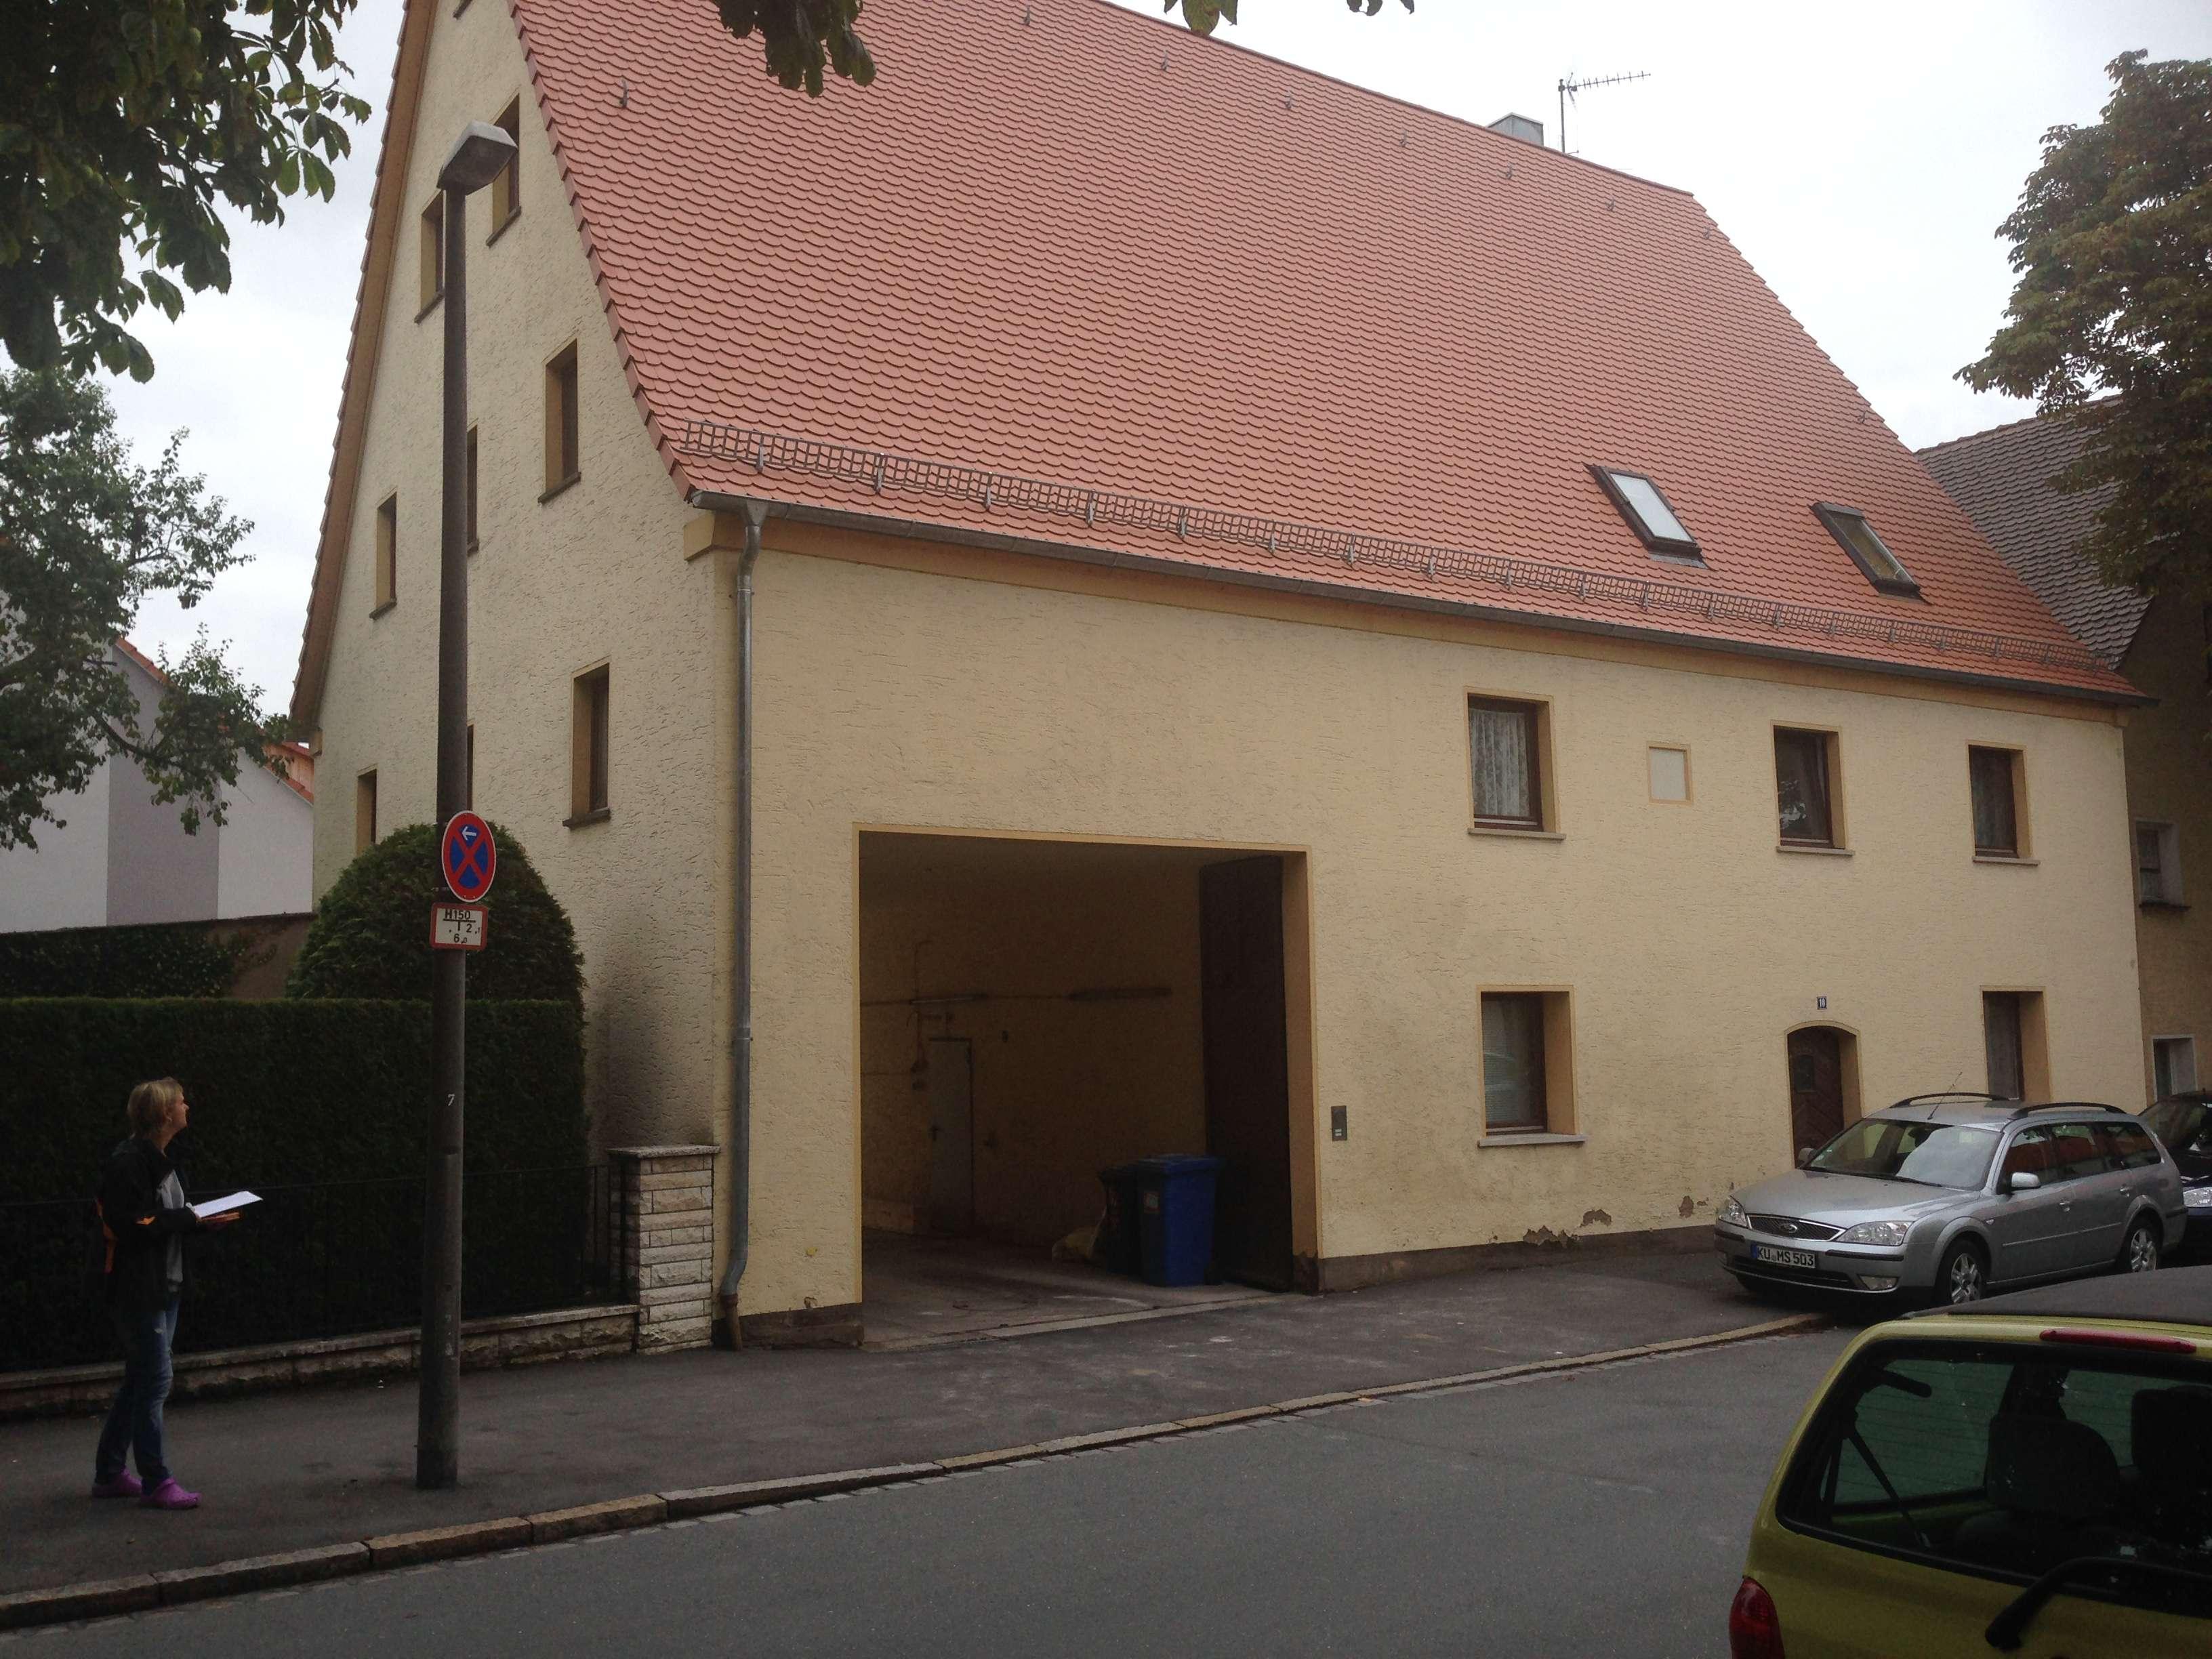 Gepflegte 4-Raum-Wohnung in Nürnberg in Großgründlach (Nürnberg)